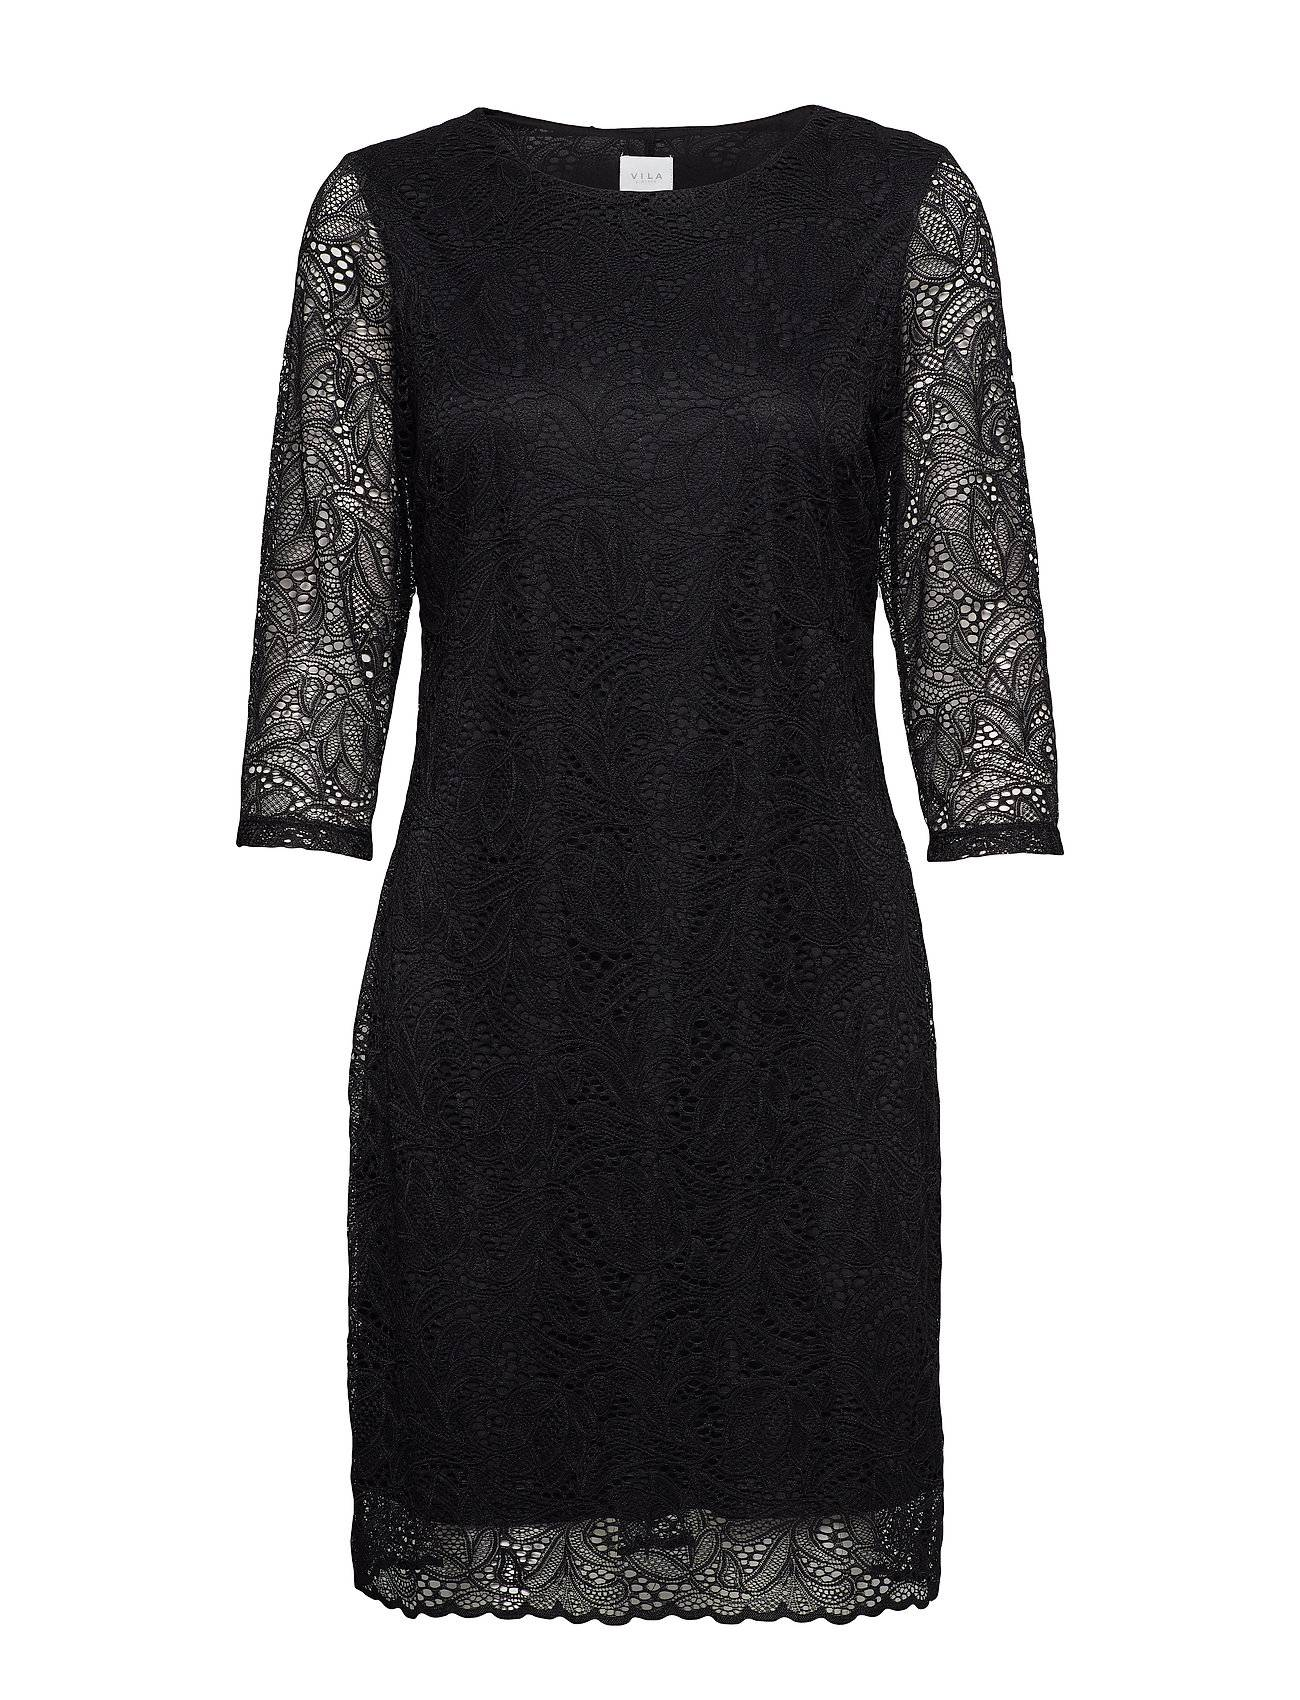 Image of VILA Viblond 3/4 Sleeve Dress - Noos Polvipituinen Mekko Musta VILA